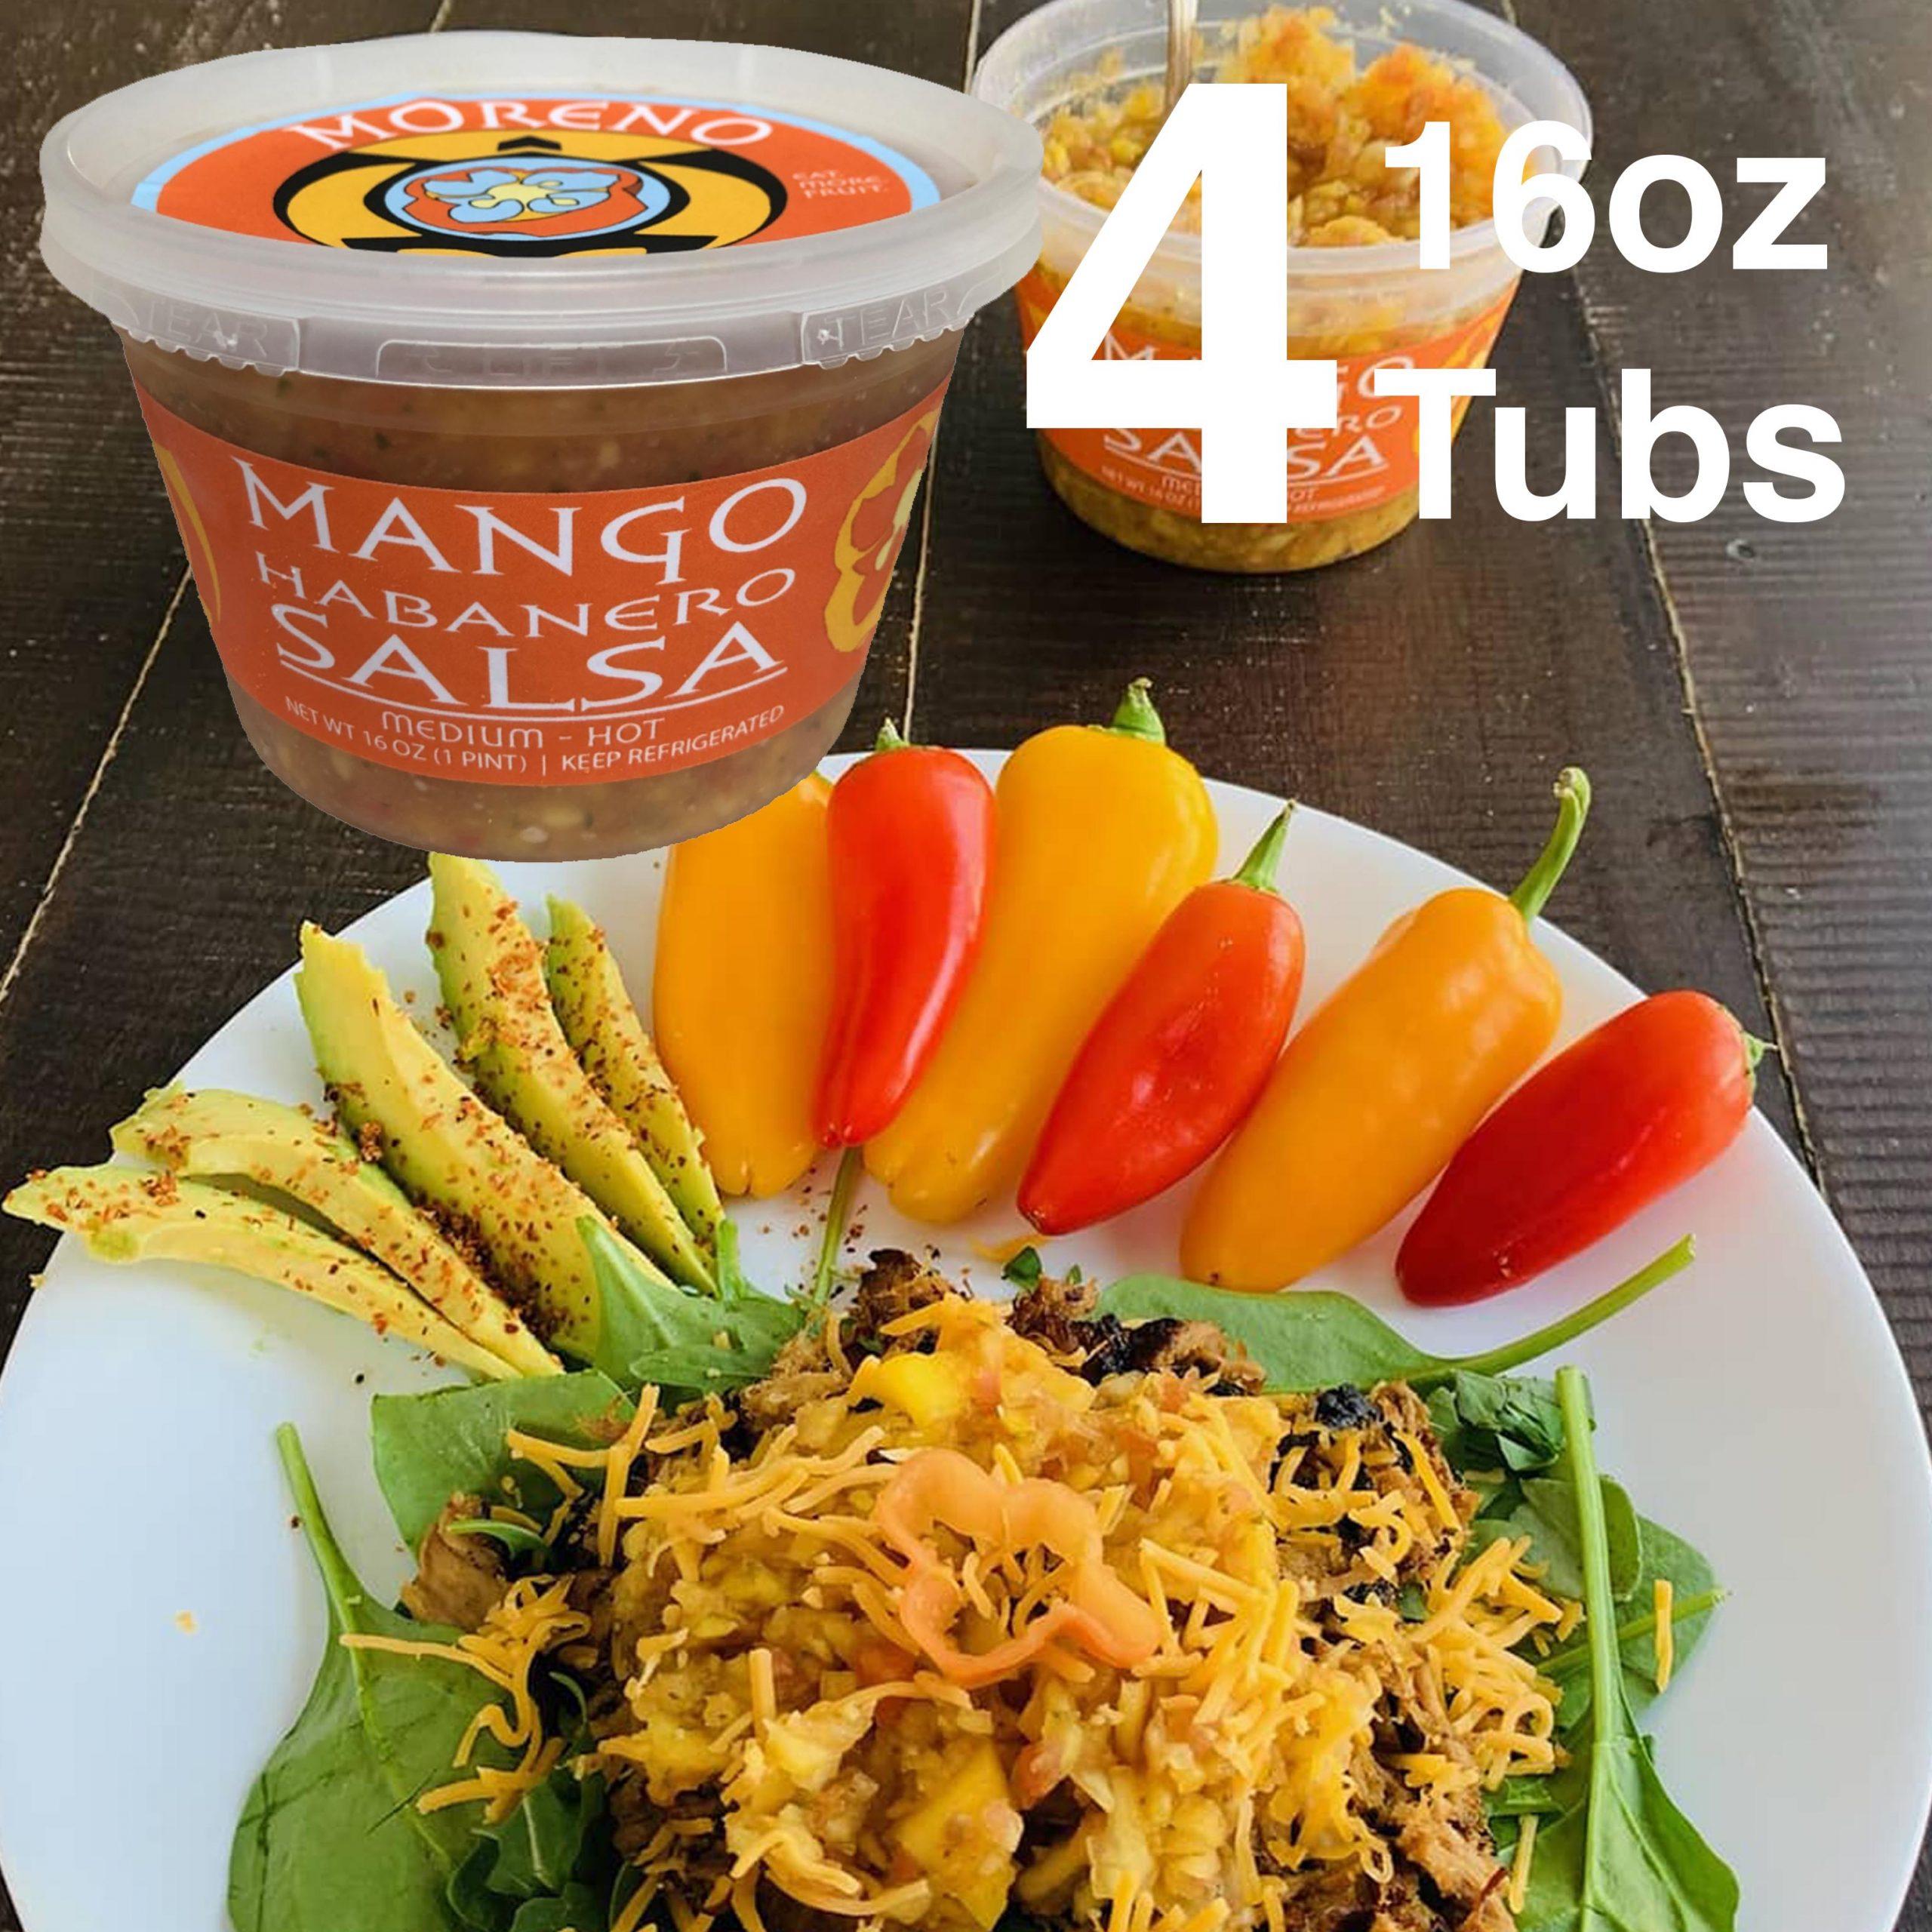 Mango Habanero Salsa 4 pack Feature